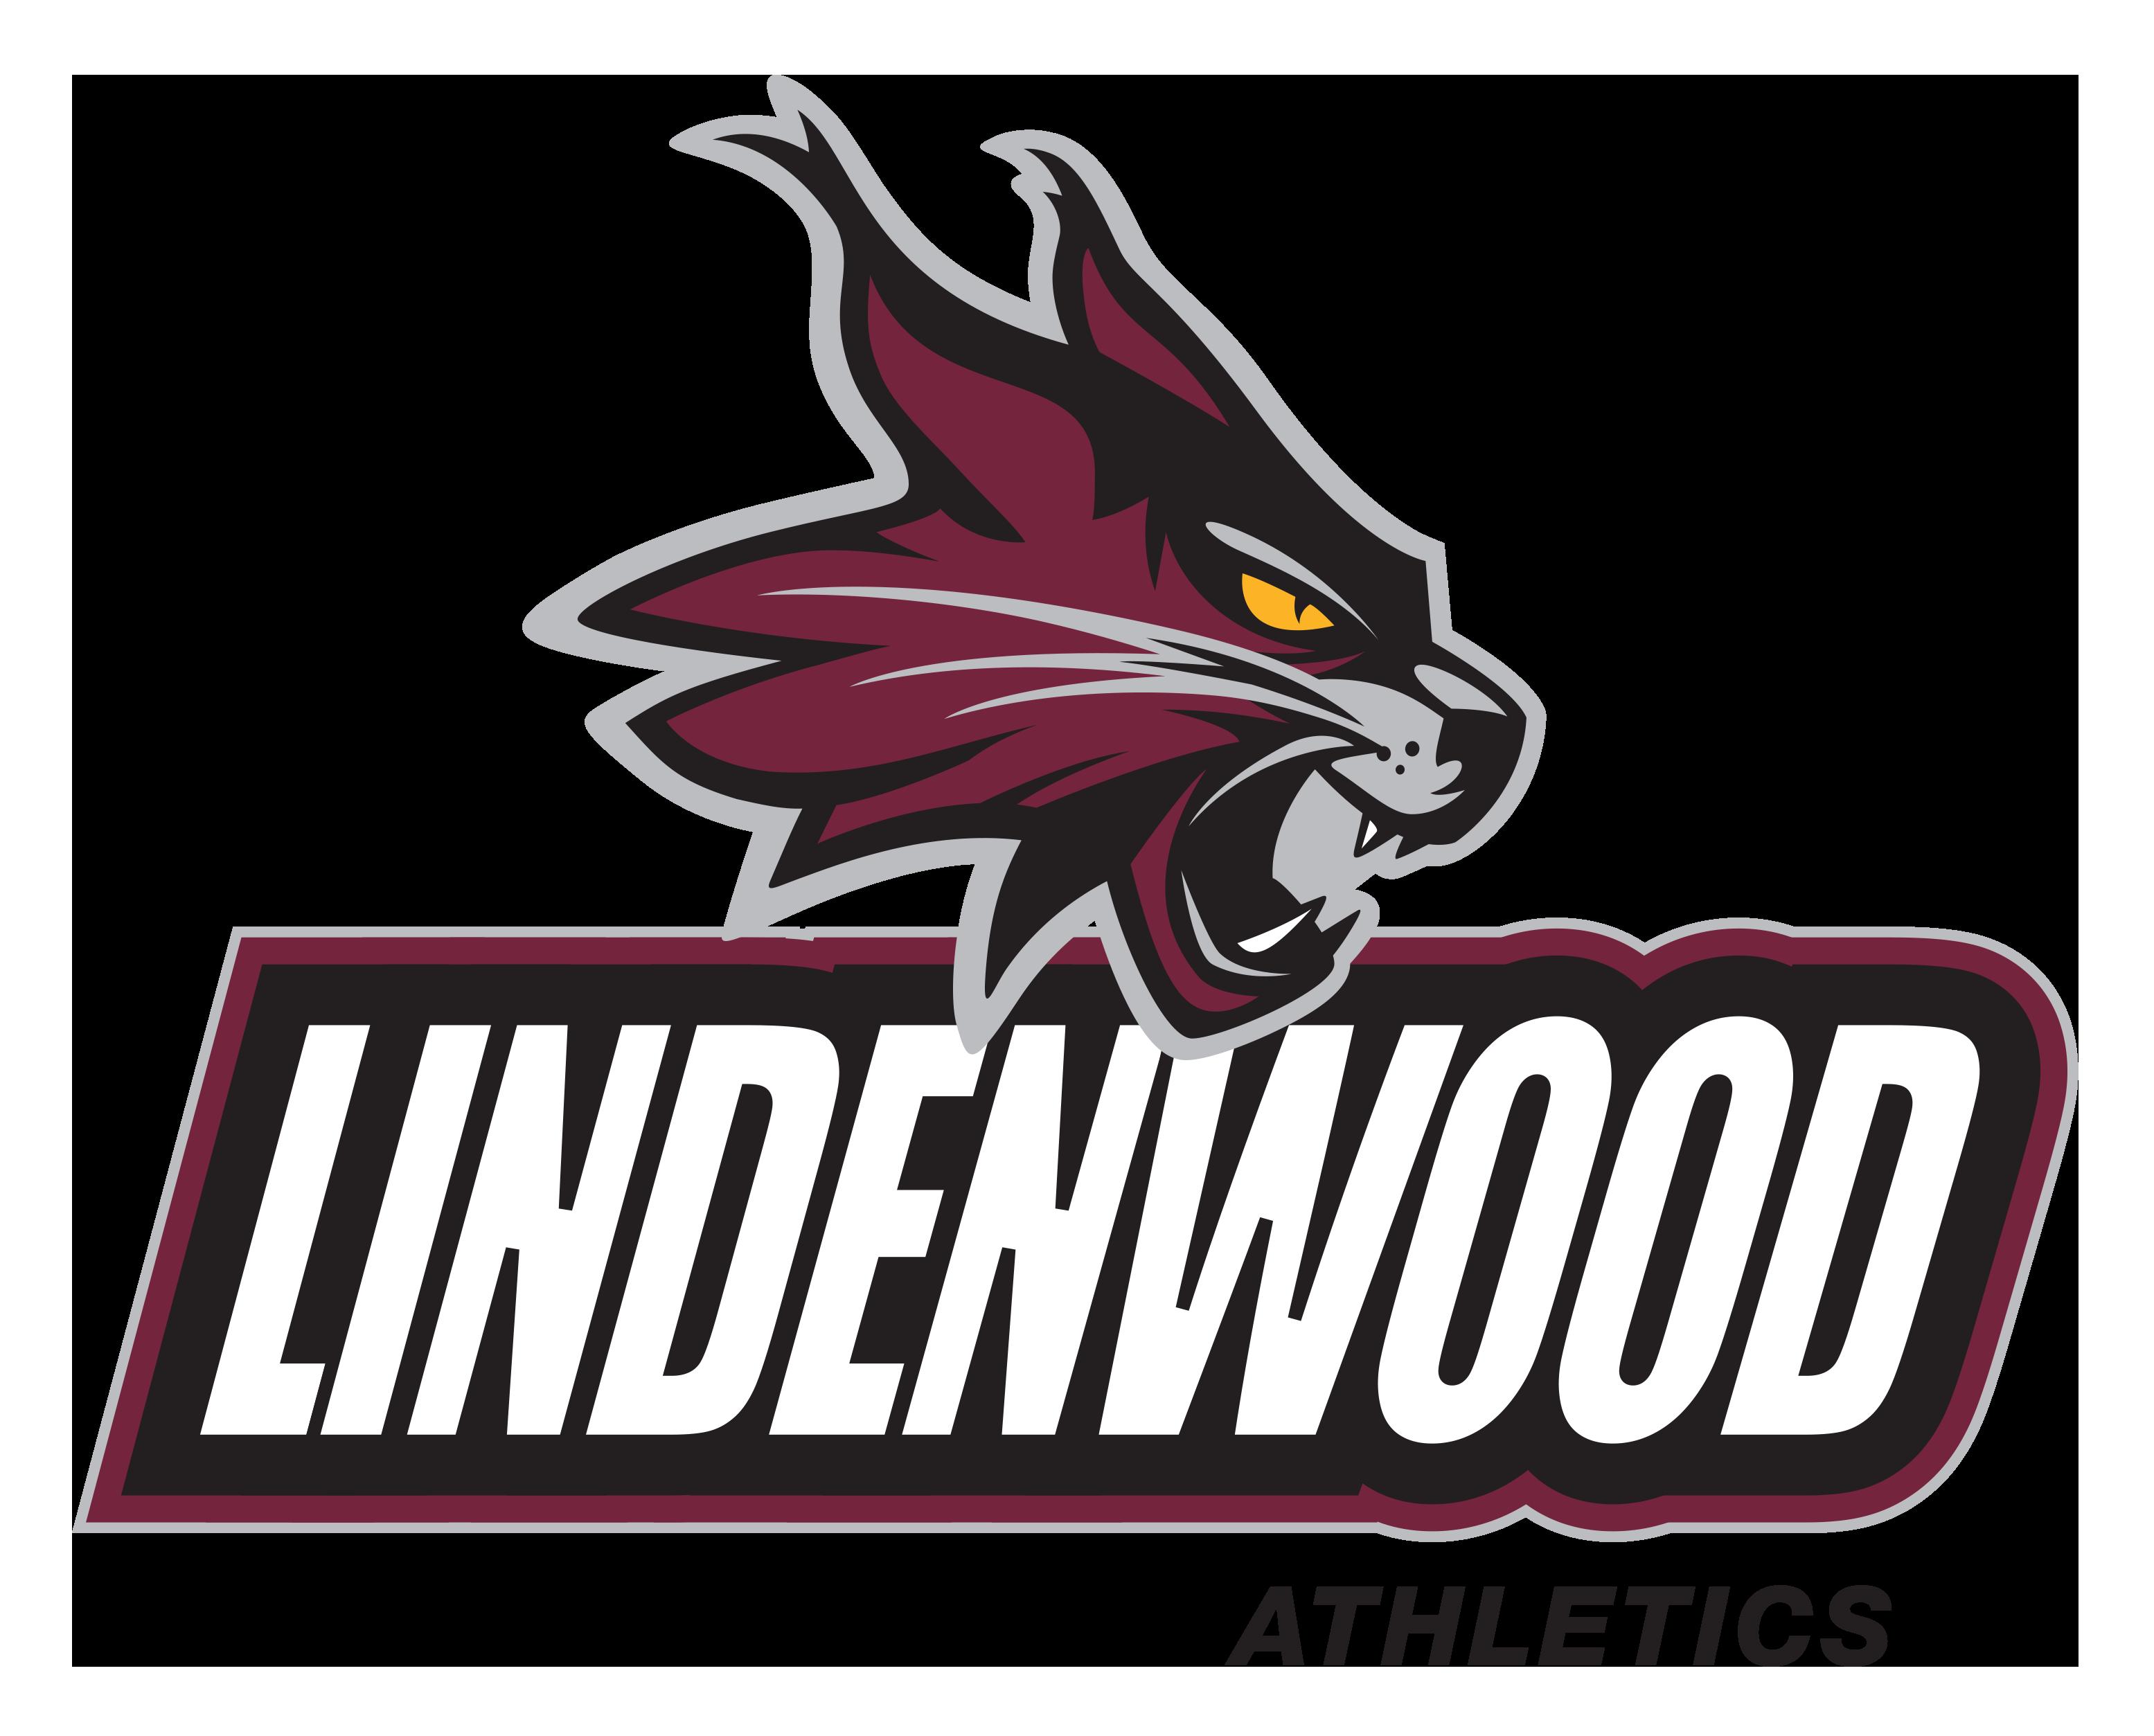 Lindenwood Belleville Athletics - Primary Logo